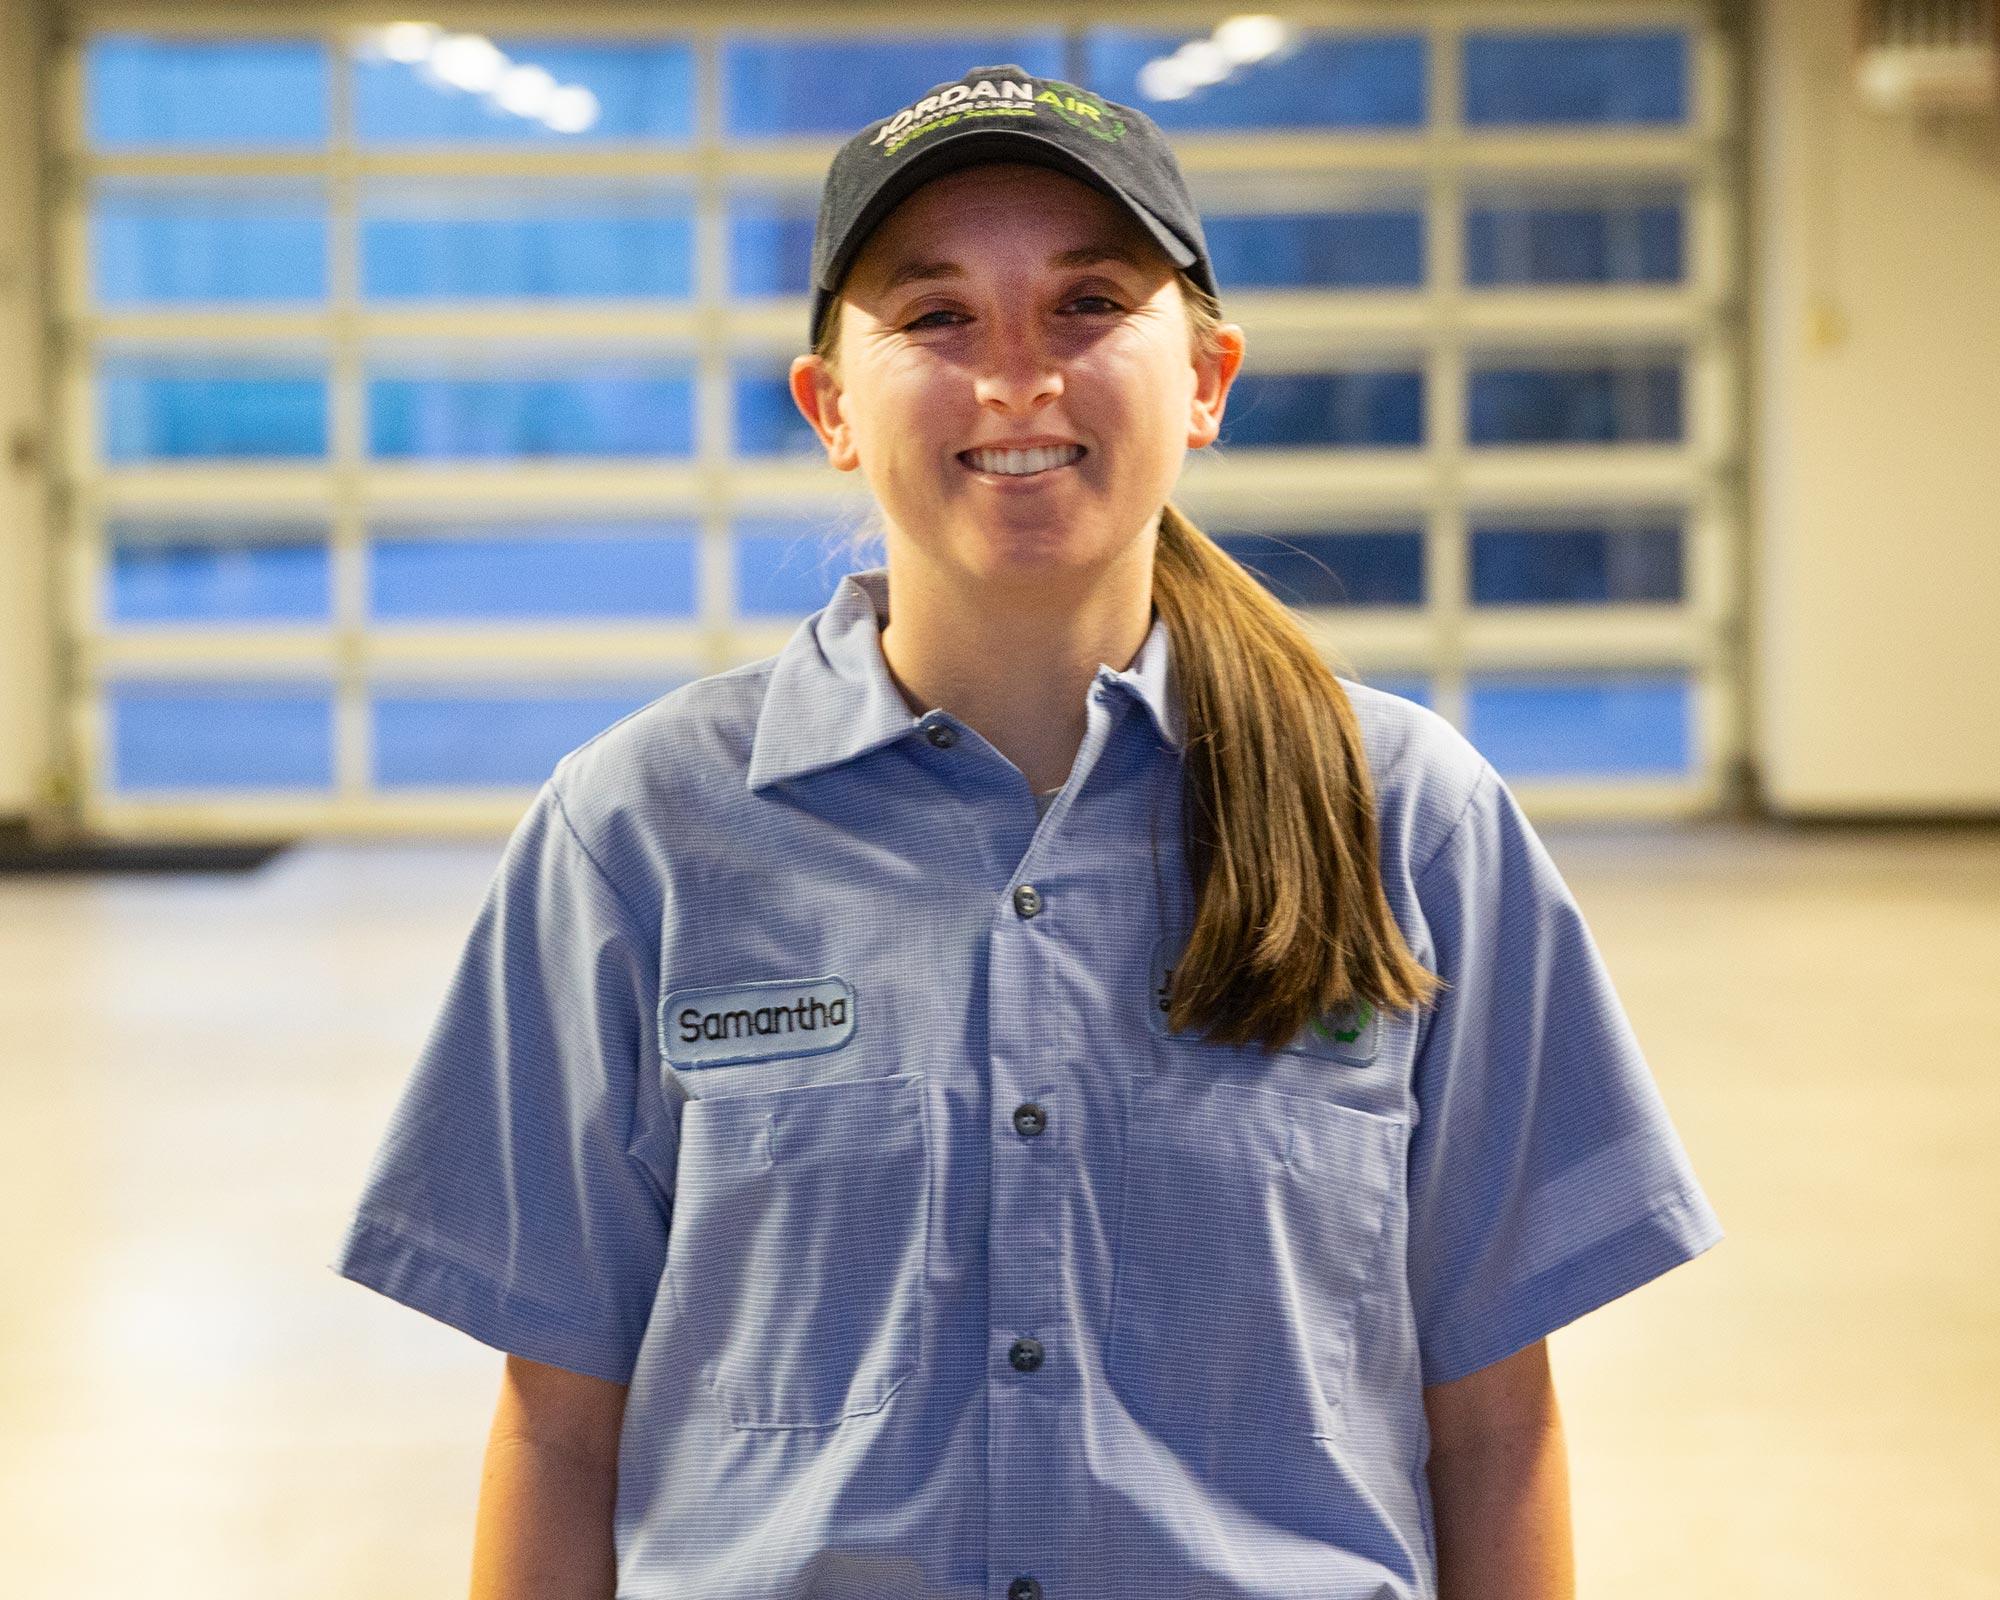 Samantha-Cash-(Service-Technician).jpg